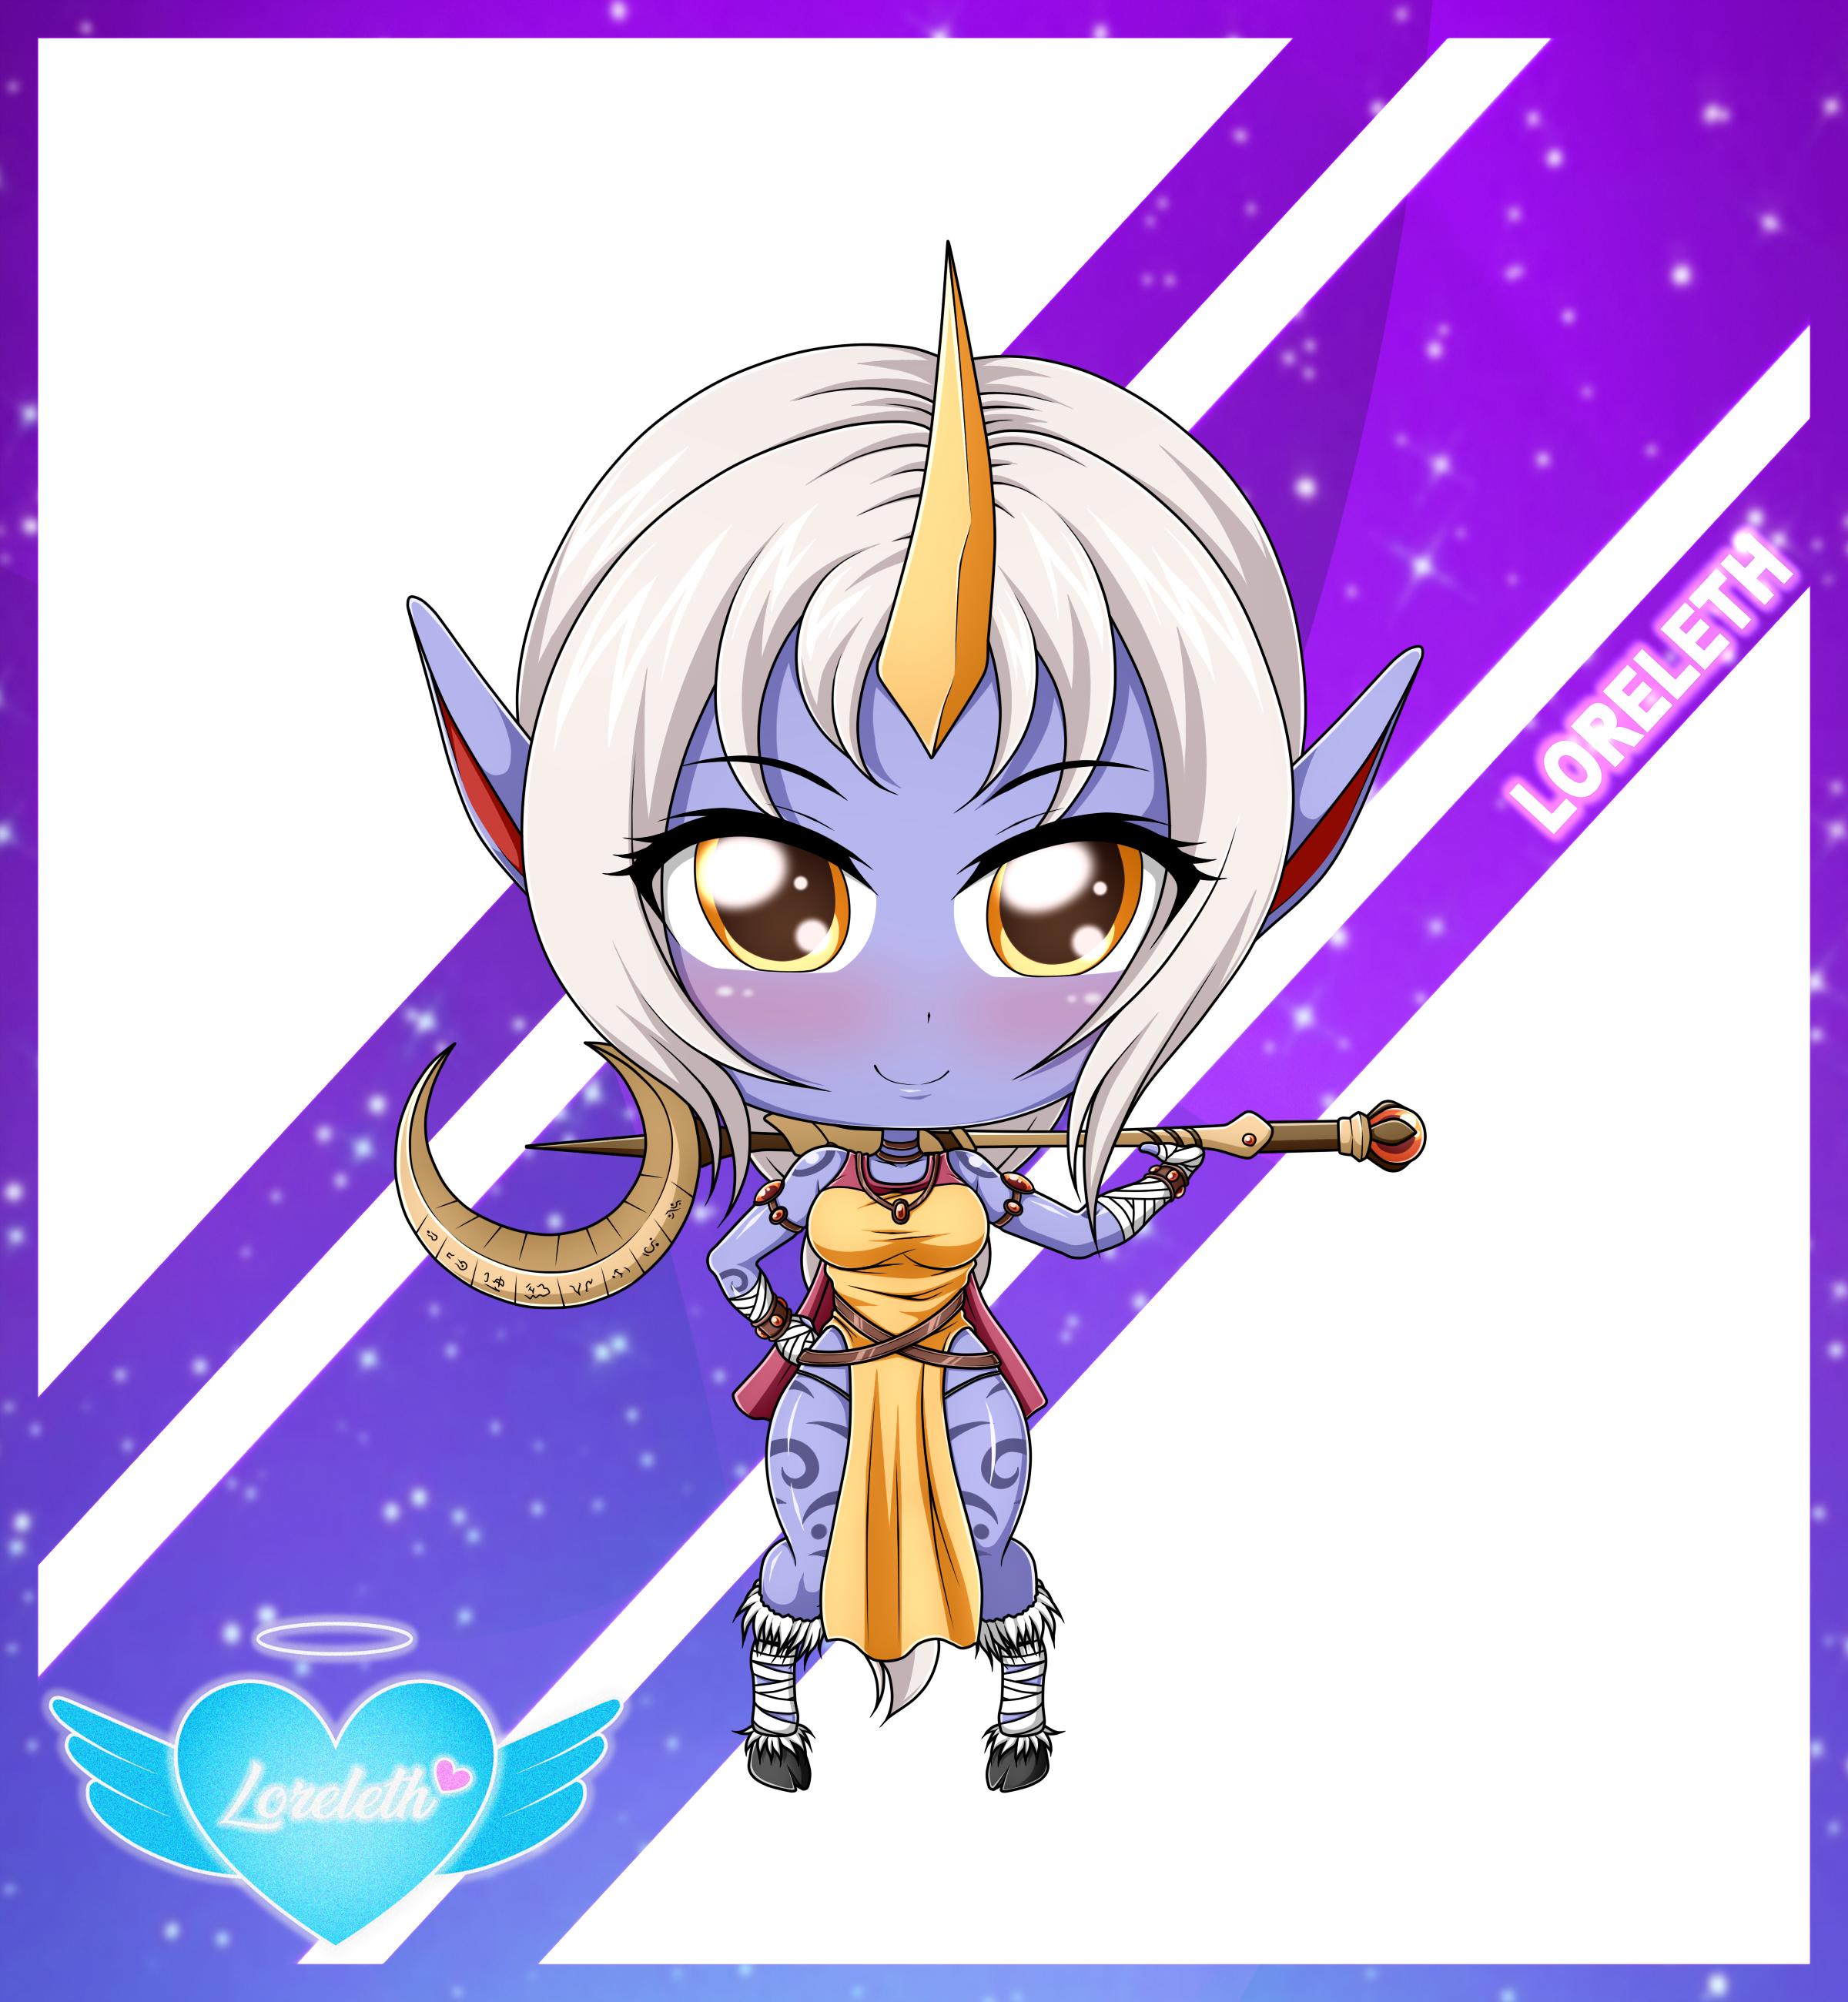 Cute Chibi Girl 55 (Commission)